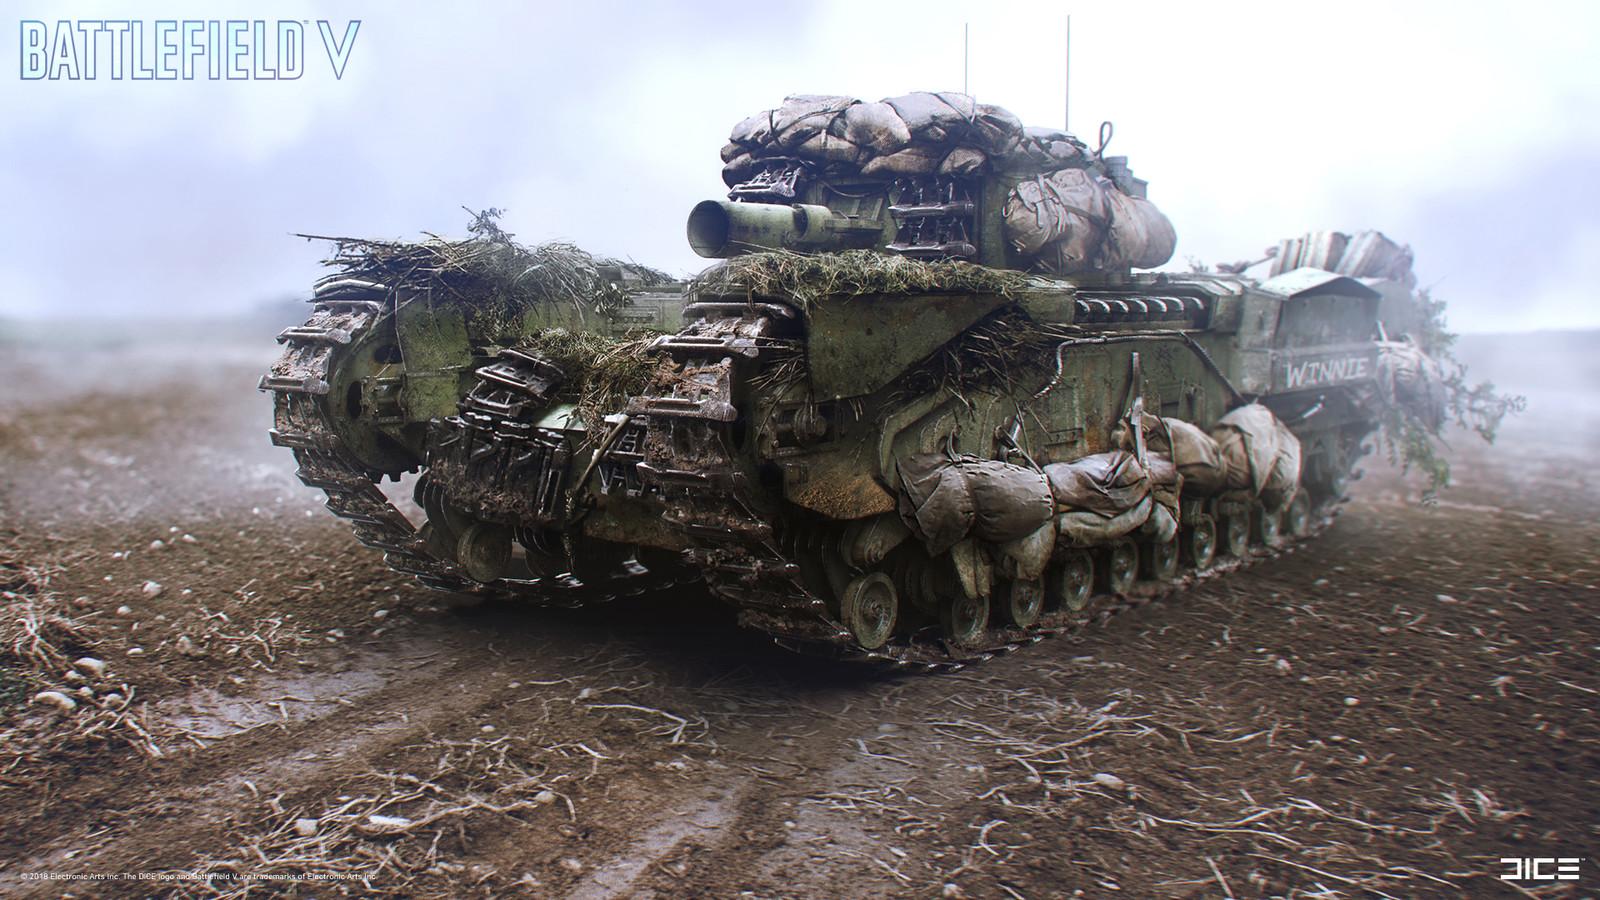 """Battlefield V"" - Churchill - Vehicle concept art. Collaboration with Debbie Tsoi."